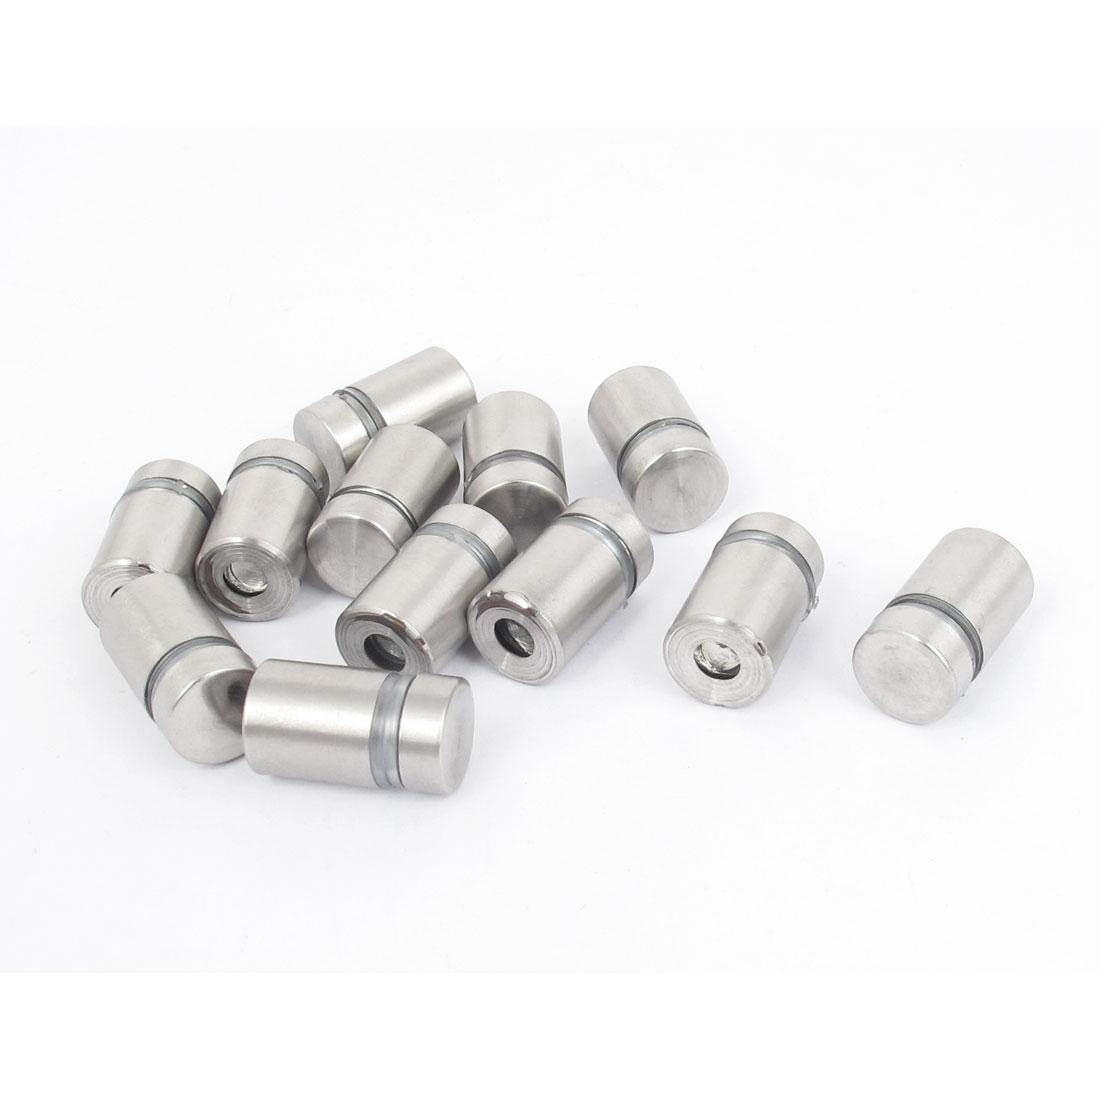 12mm x 20mm Stainless Steel Advertising Frameless Glass Standoff Pins 12pcs